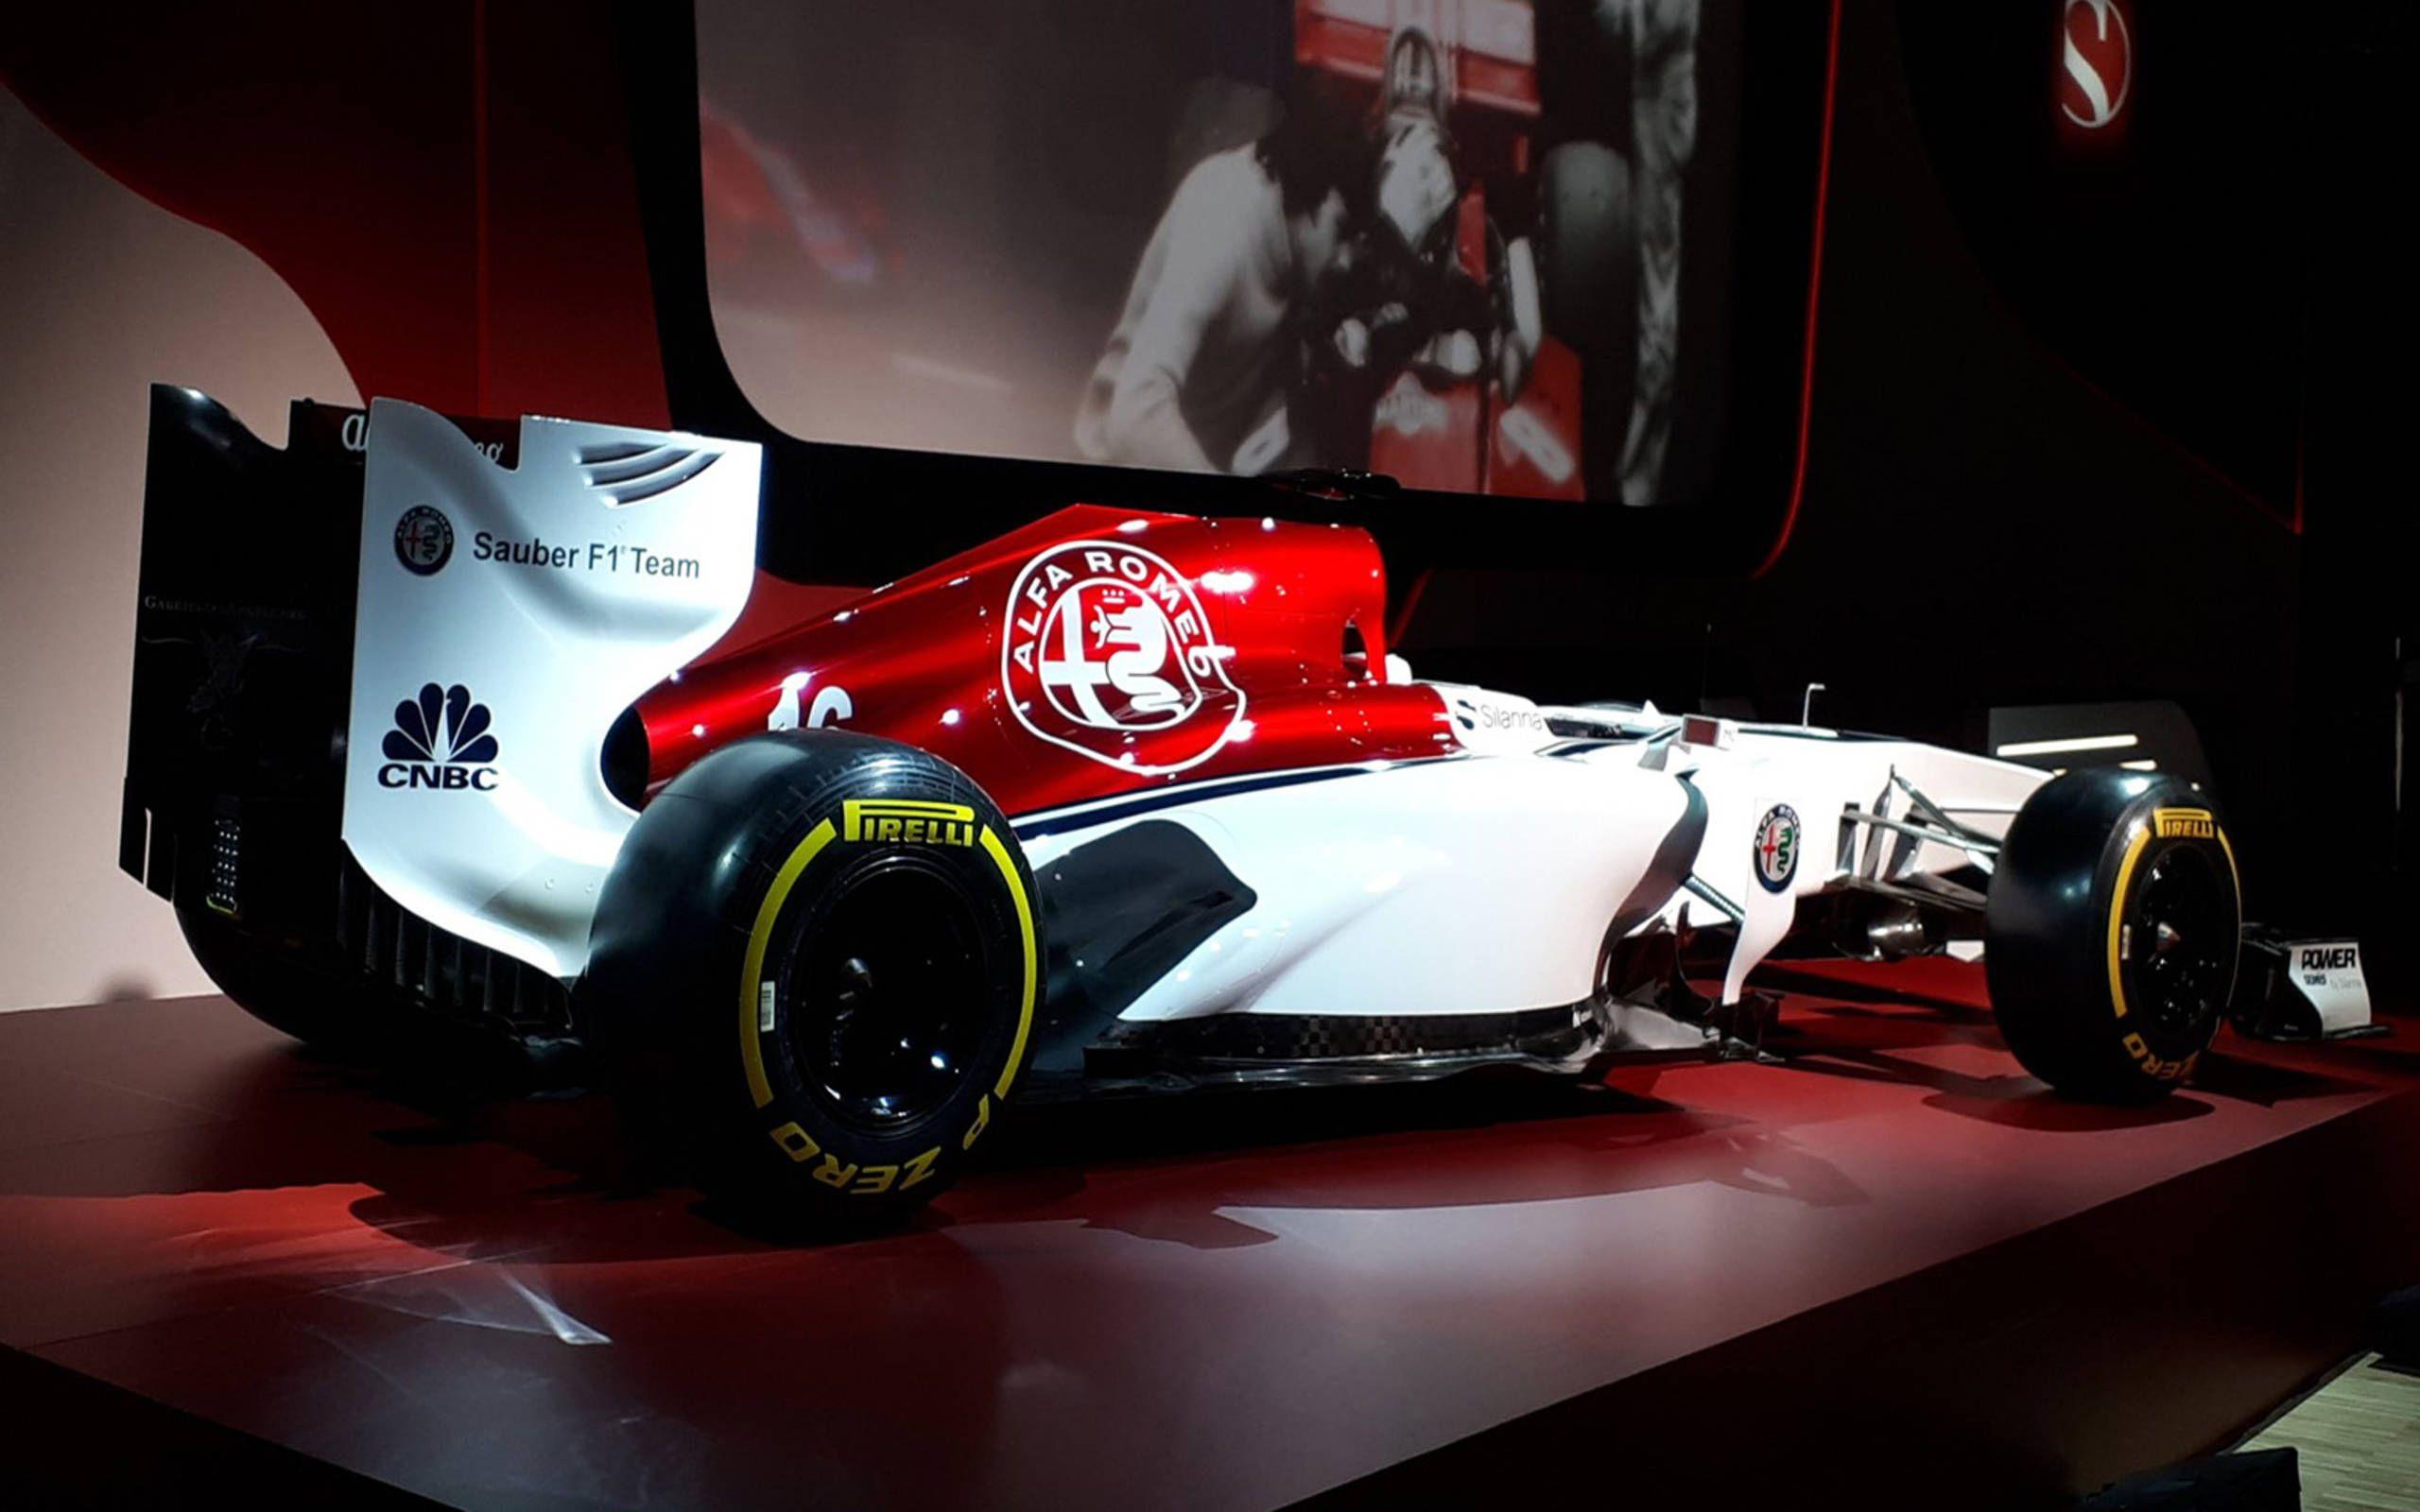 Sauber F1 Introduces 2018 Driver Lineup Shows Off New Alfa Romeo Paint Scheme